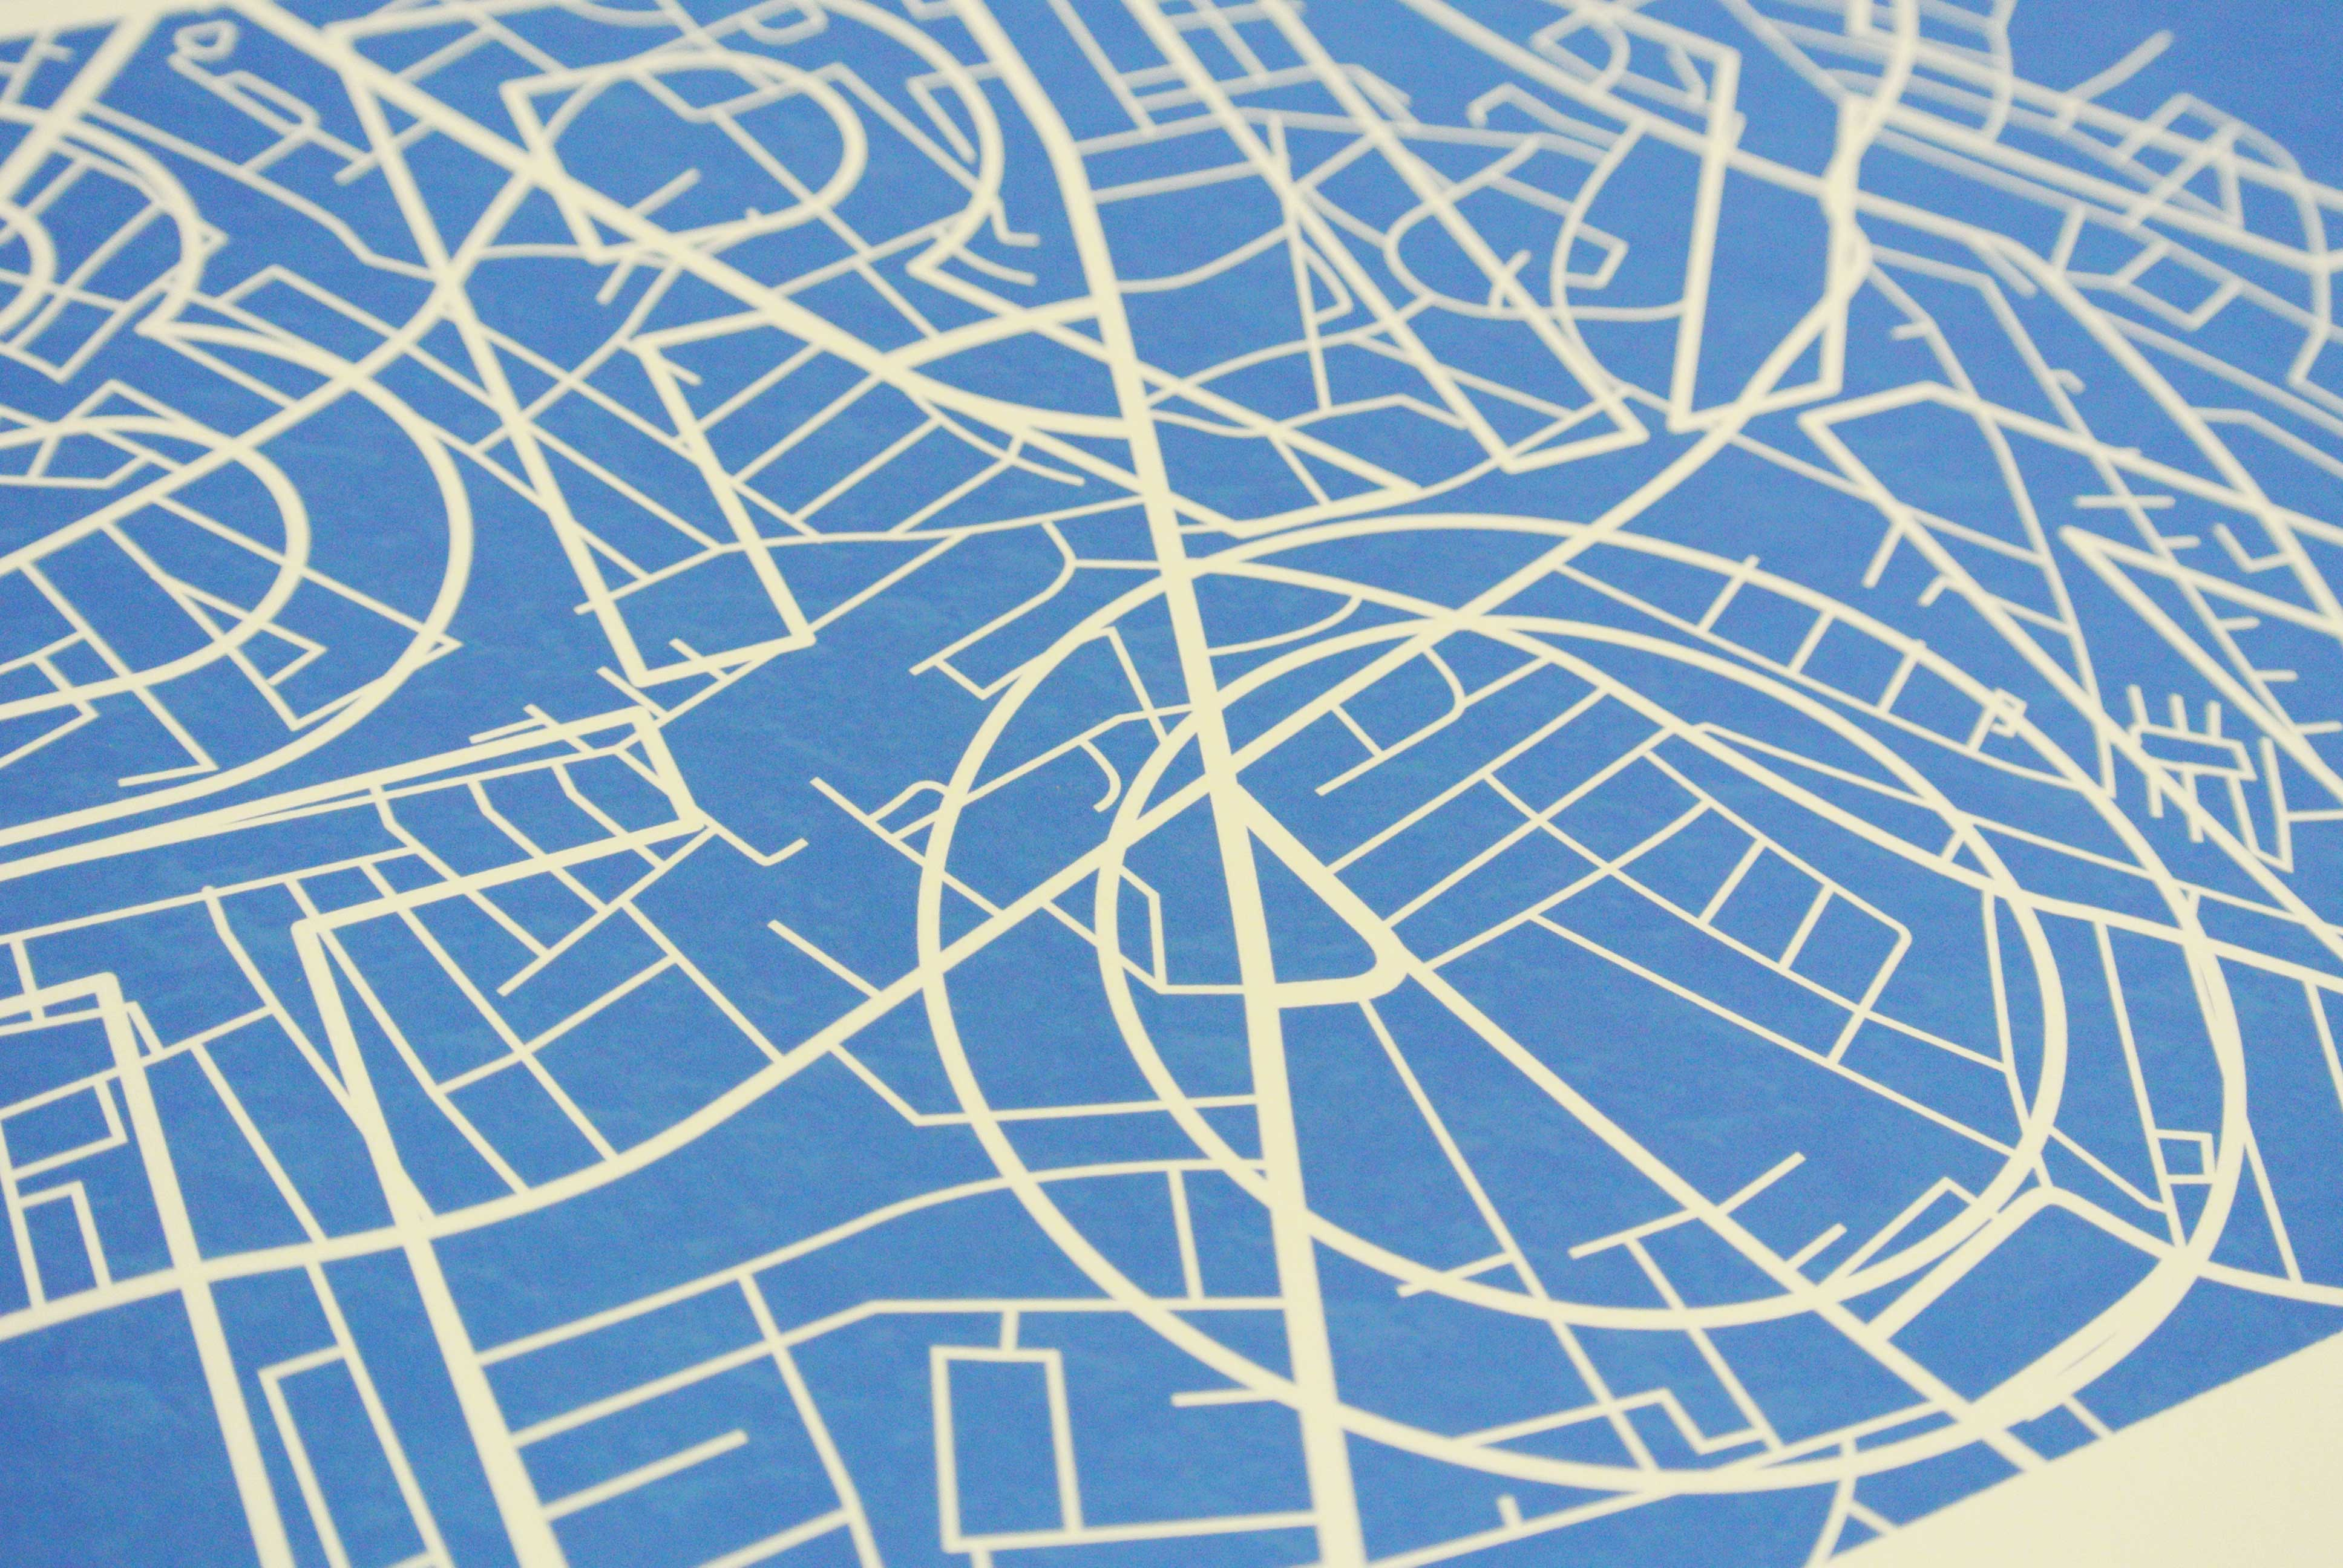 Streets of Brixton Art Poster Print